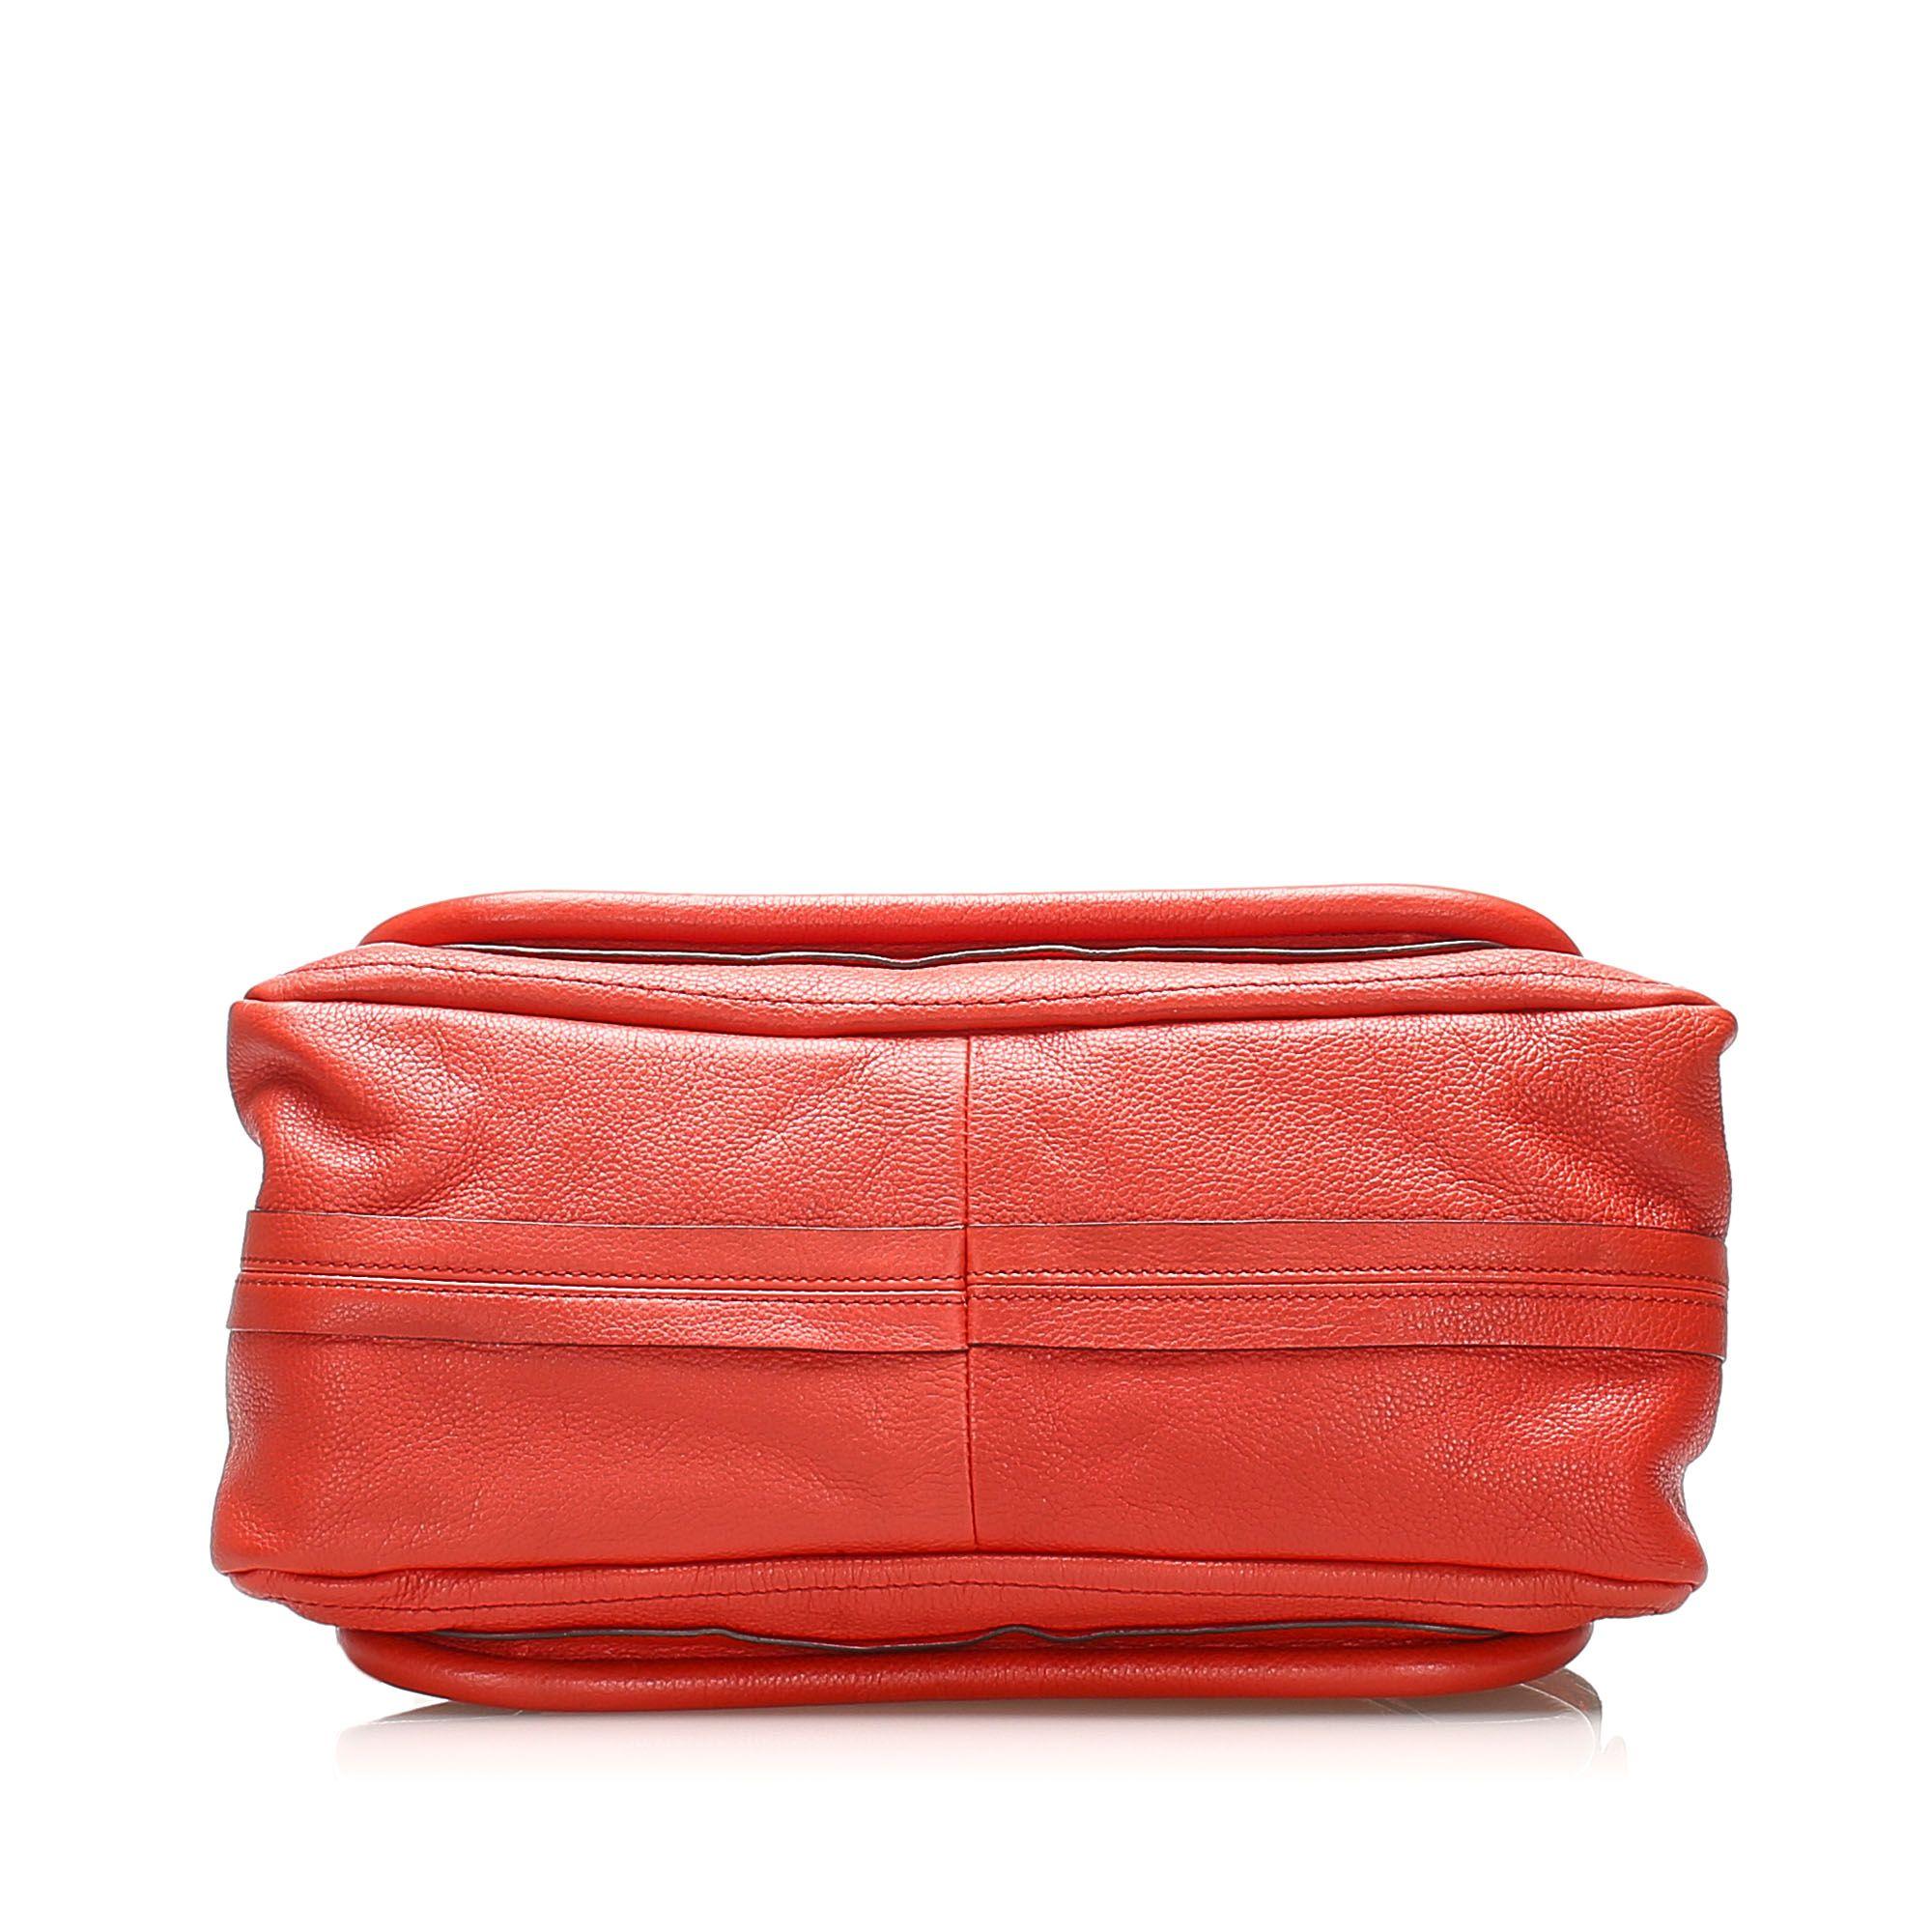 Vintage Chloe Paraty Leather Satchel Red